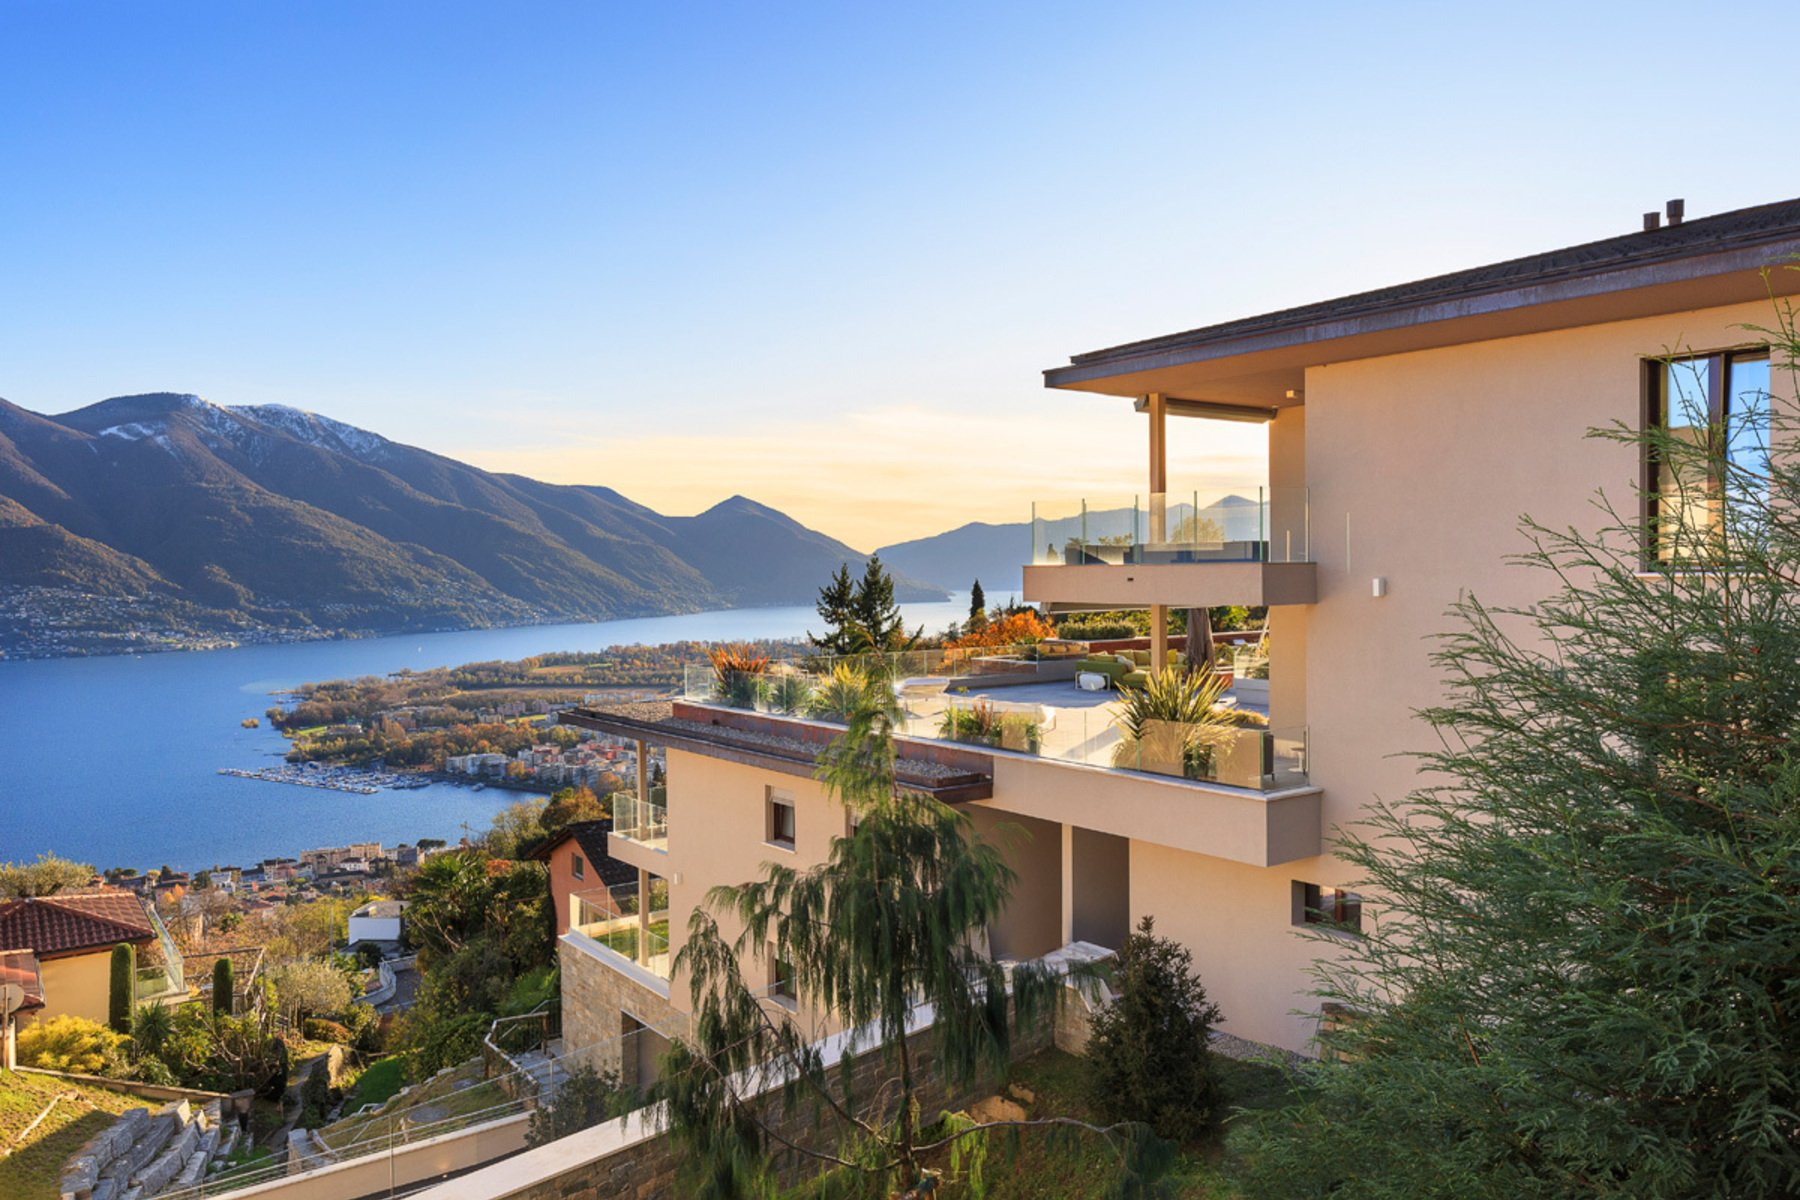 Apartment in Minusio, Ticino, Switzerland 1